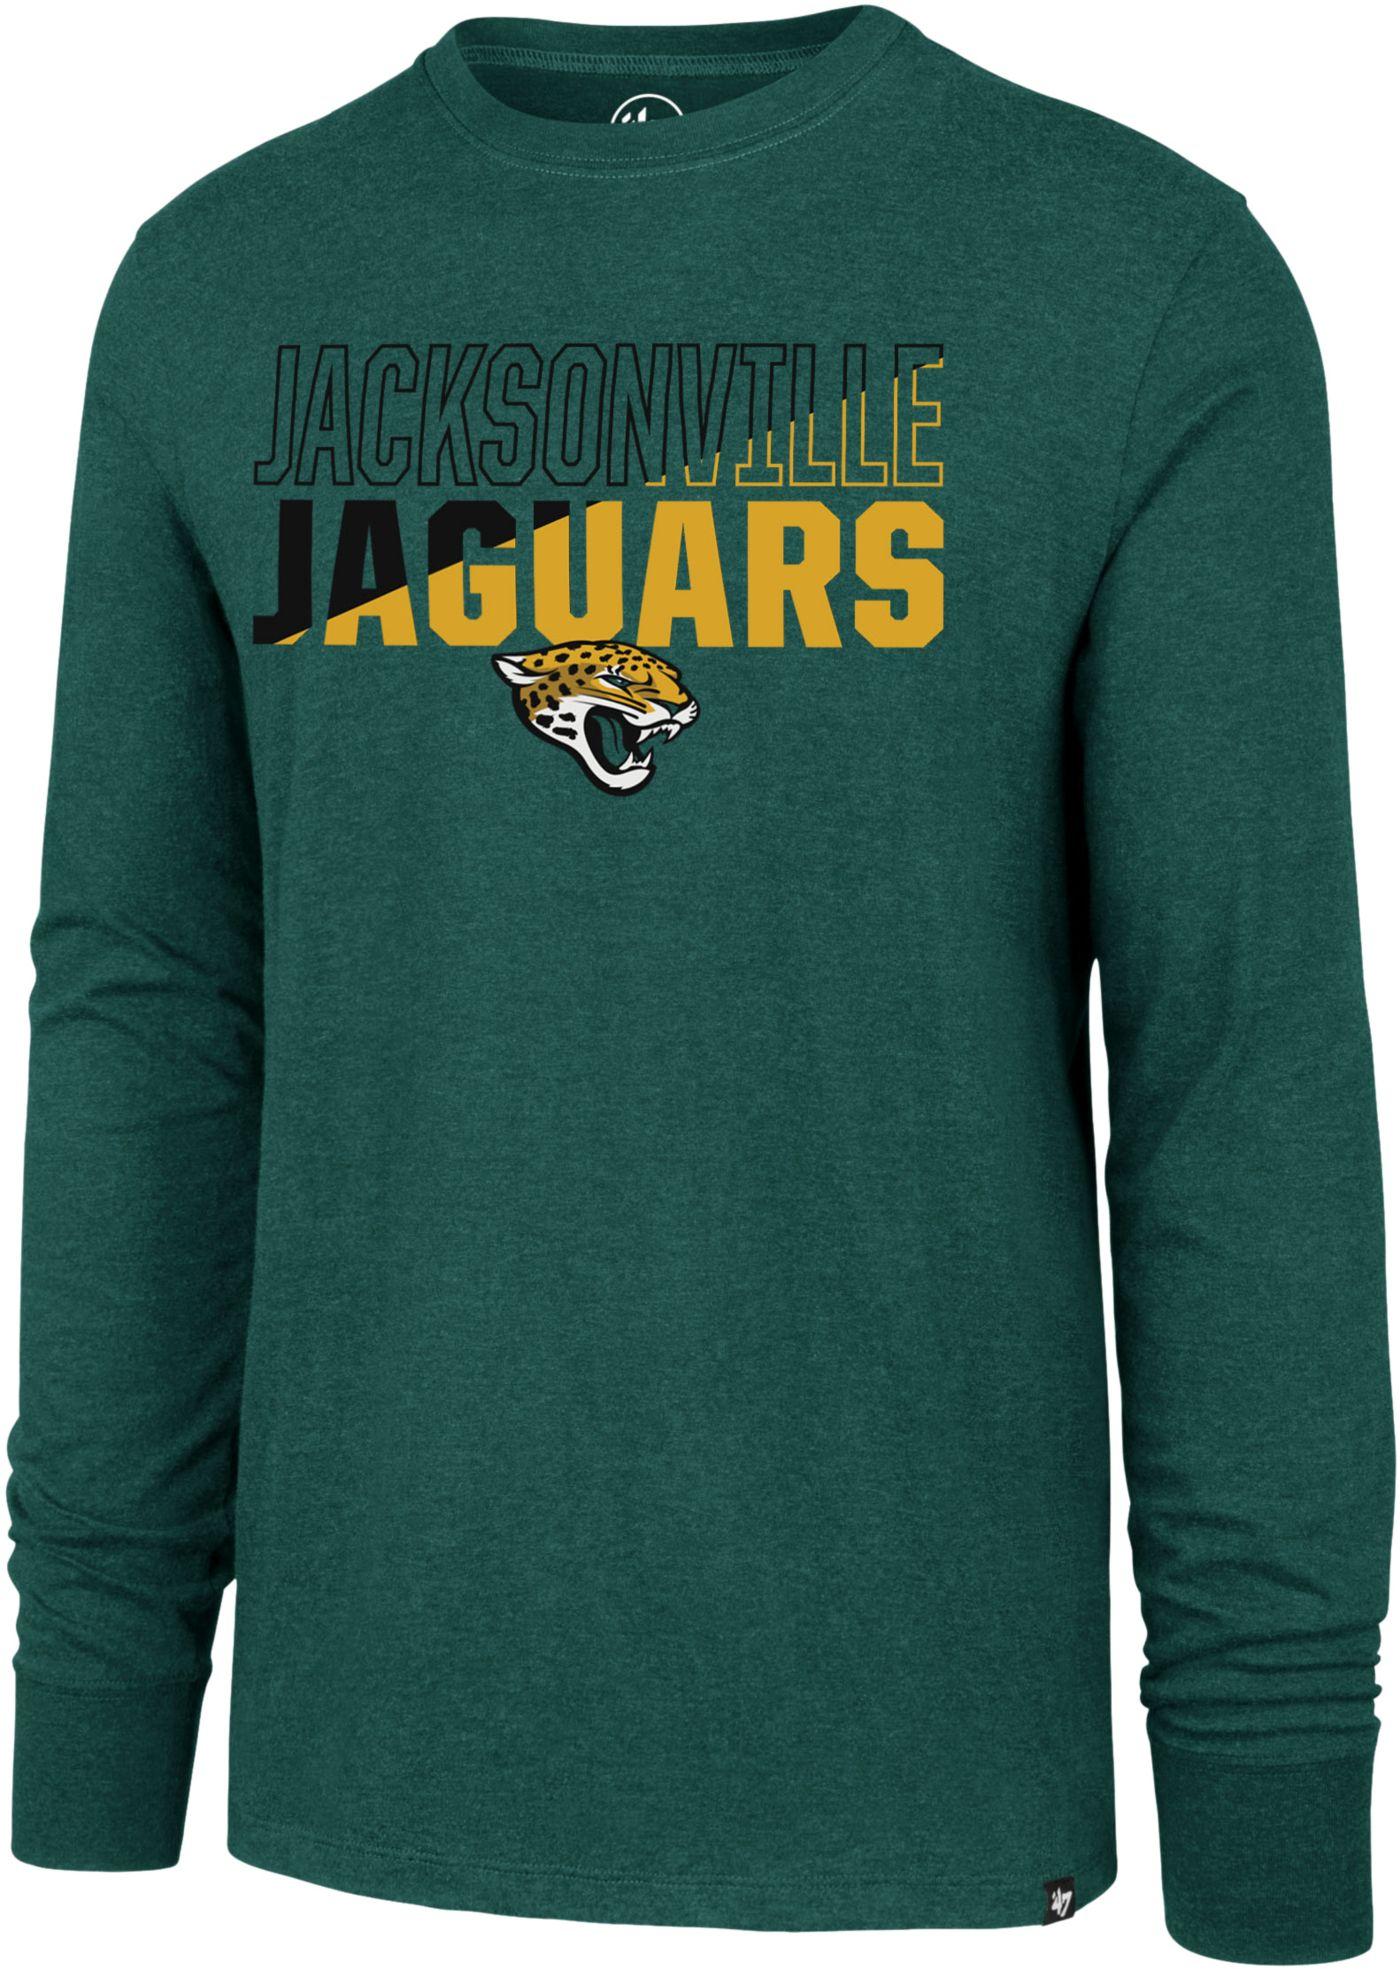 '47 Men's Jacksonville Jaguars Club Long Sleeve Teal Shirt